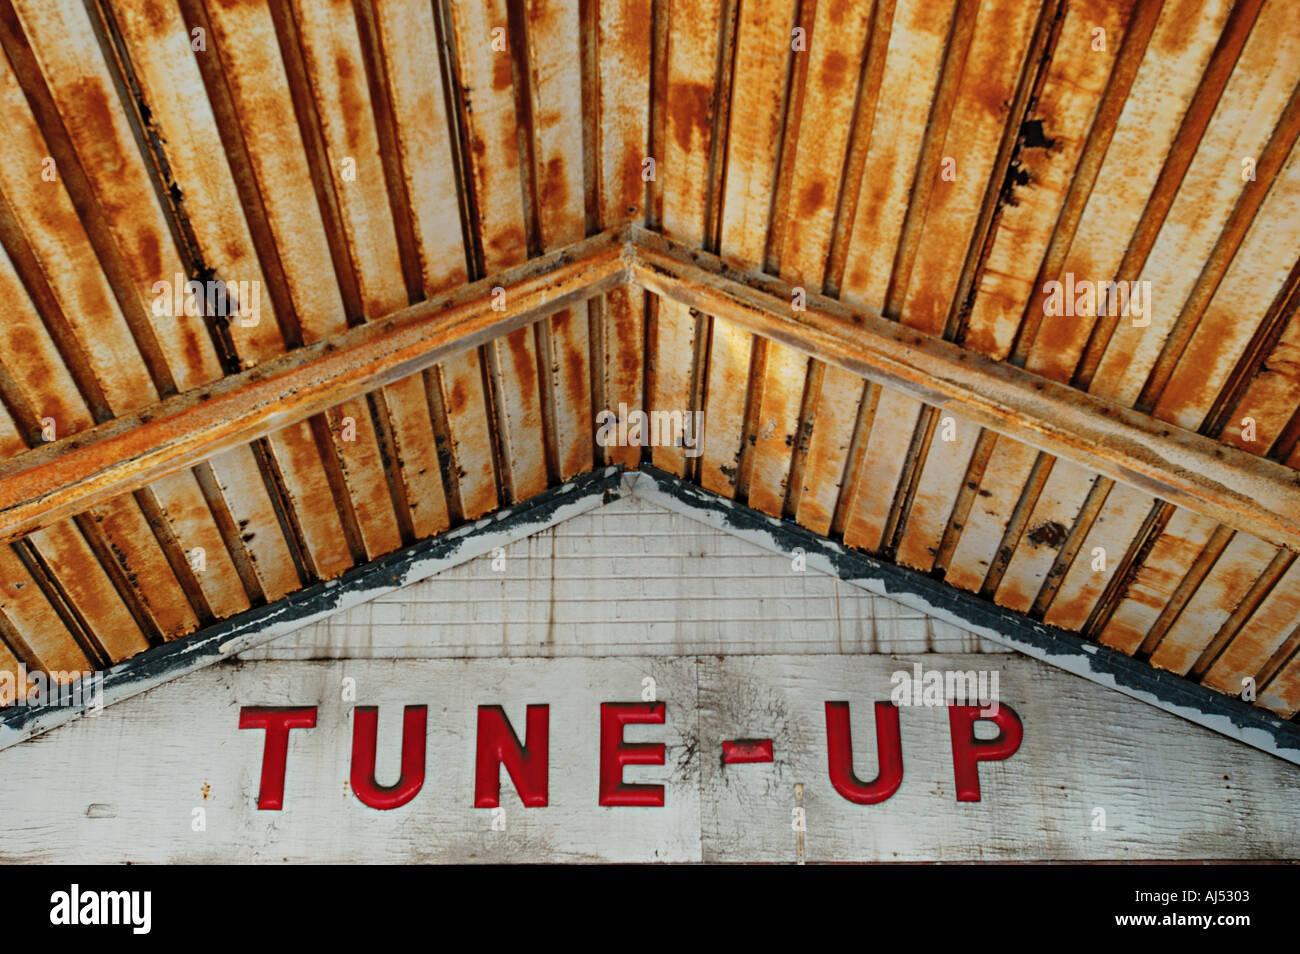 Tune Up - Stock Image